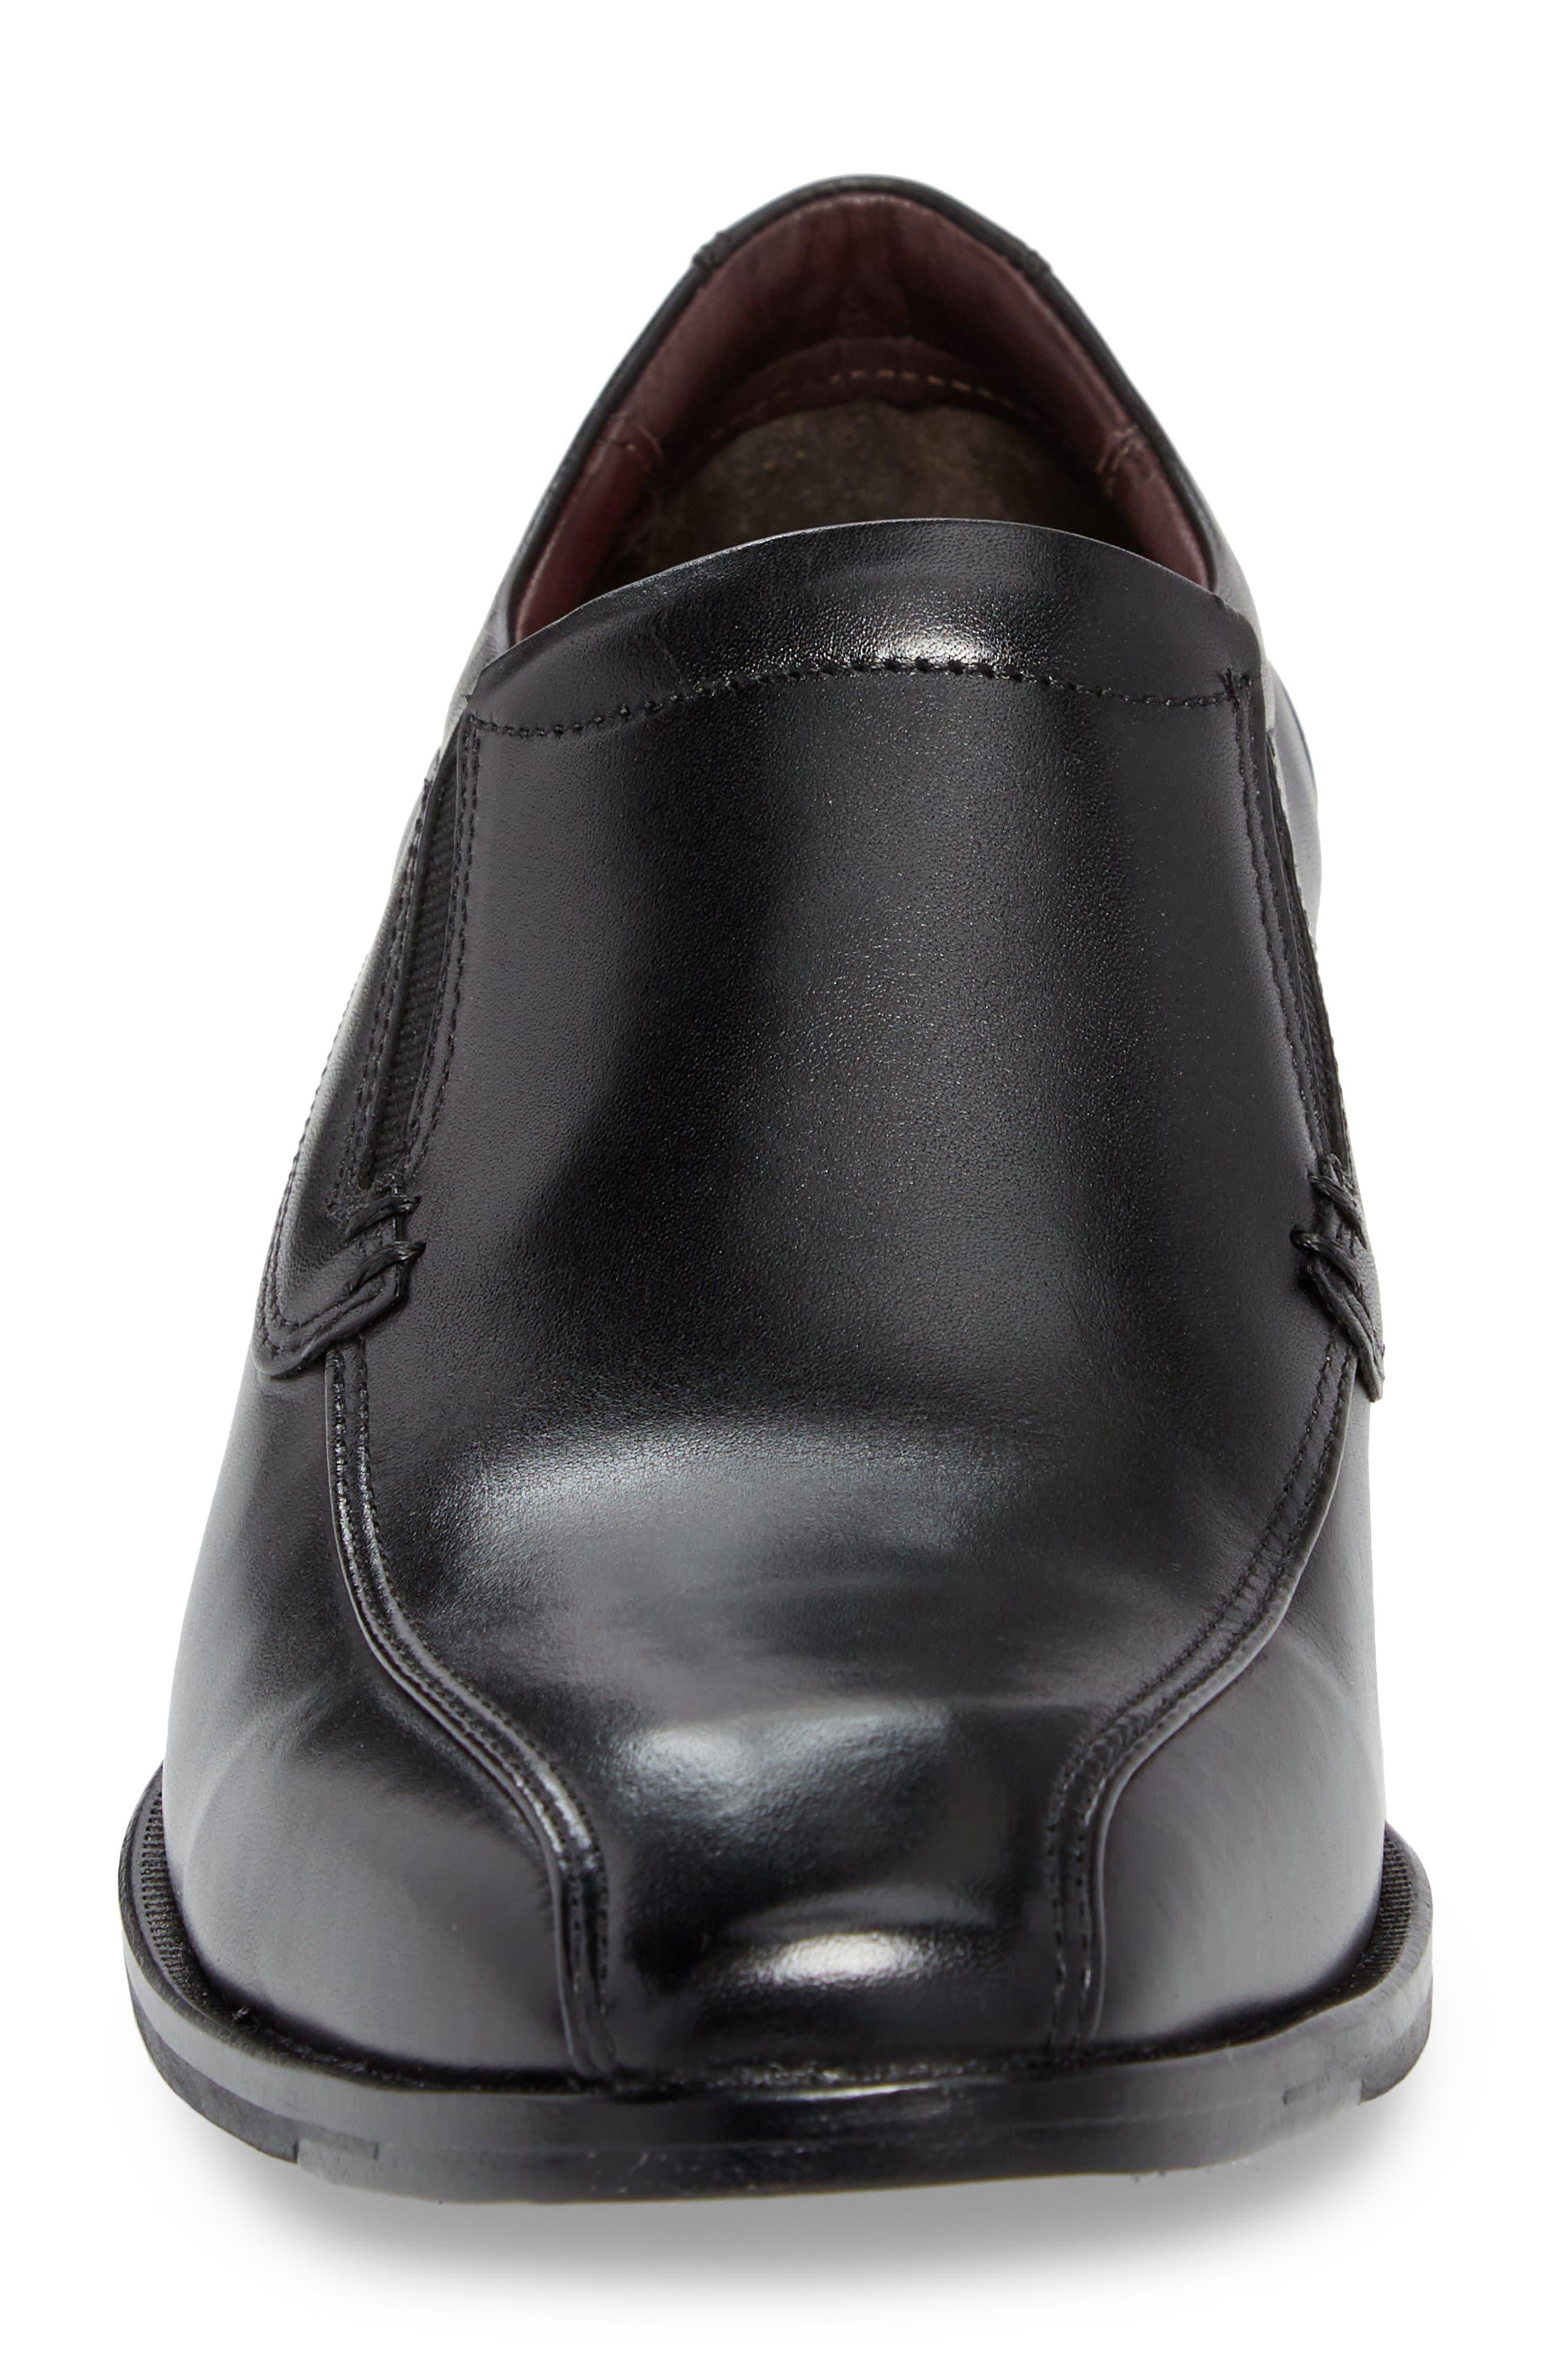 McClain Runoff Bike Toe Slip-On,                             Alternate thumbnail 4, color,                             Black Leather